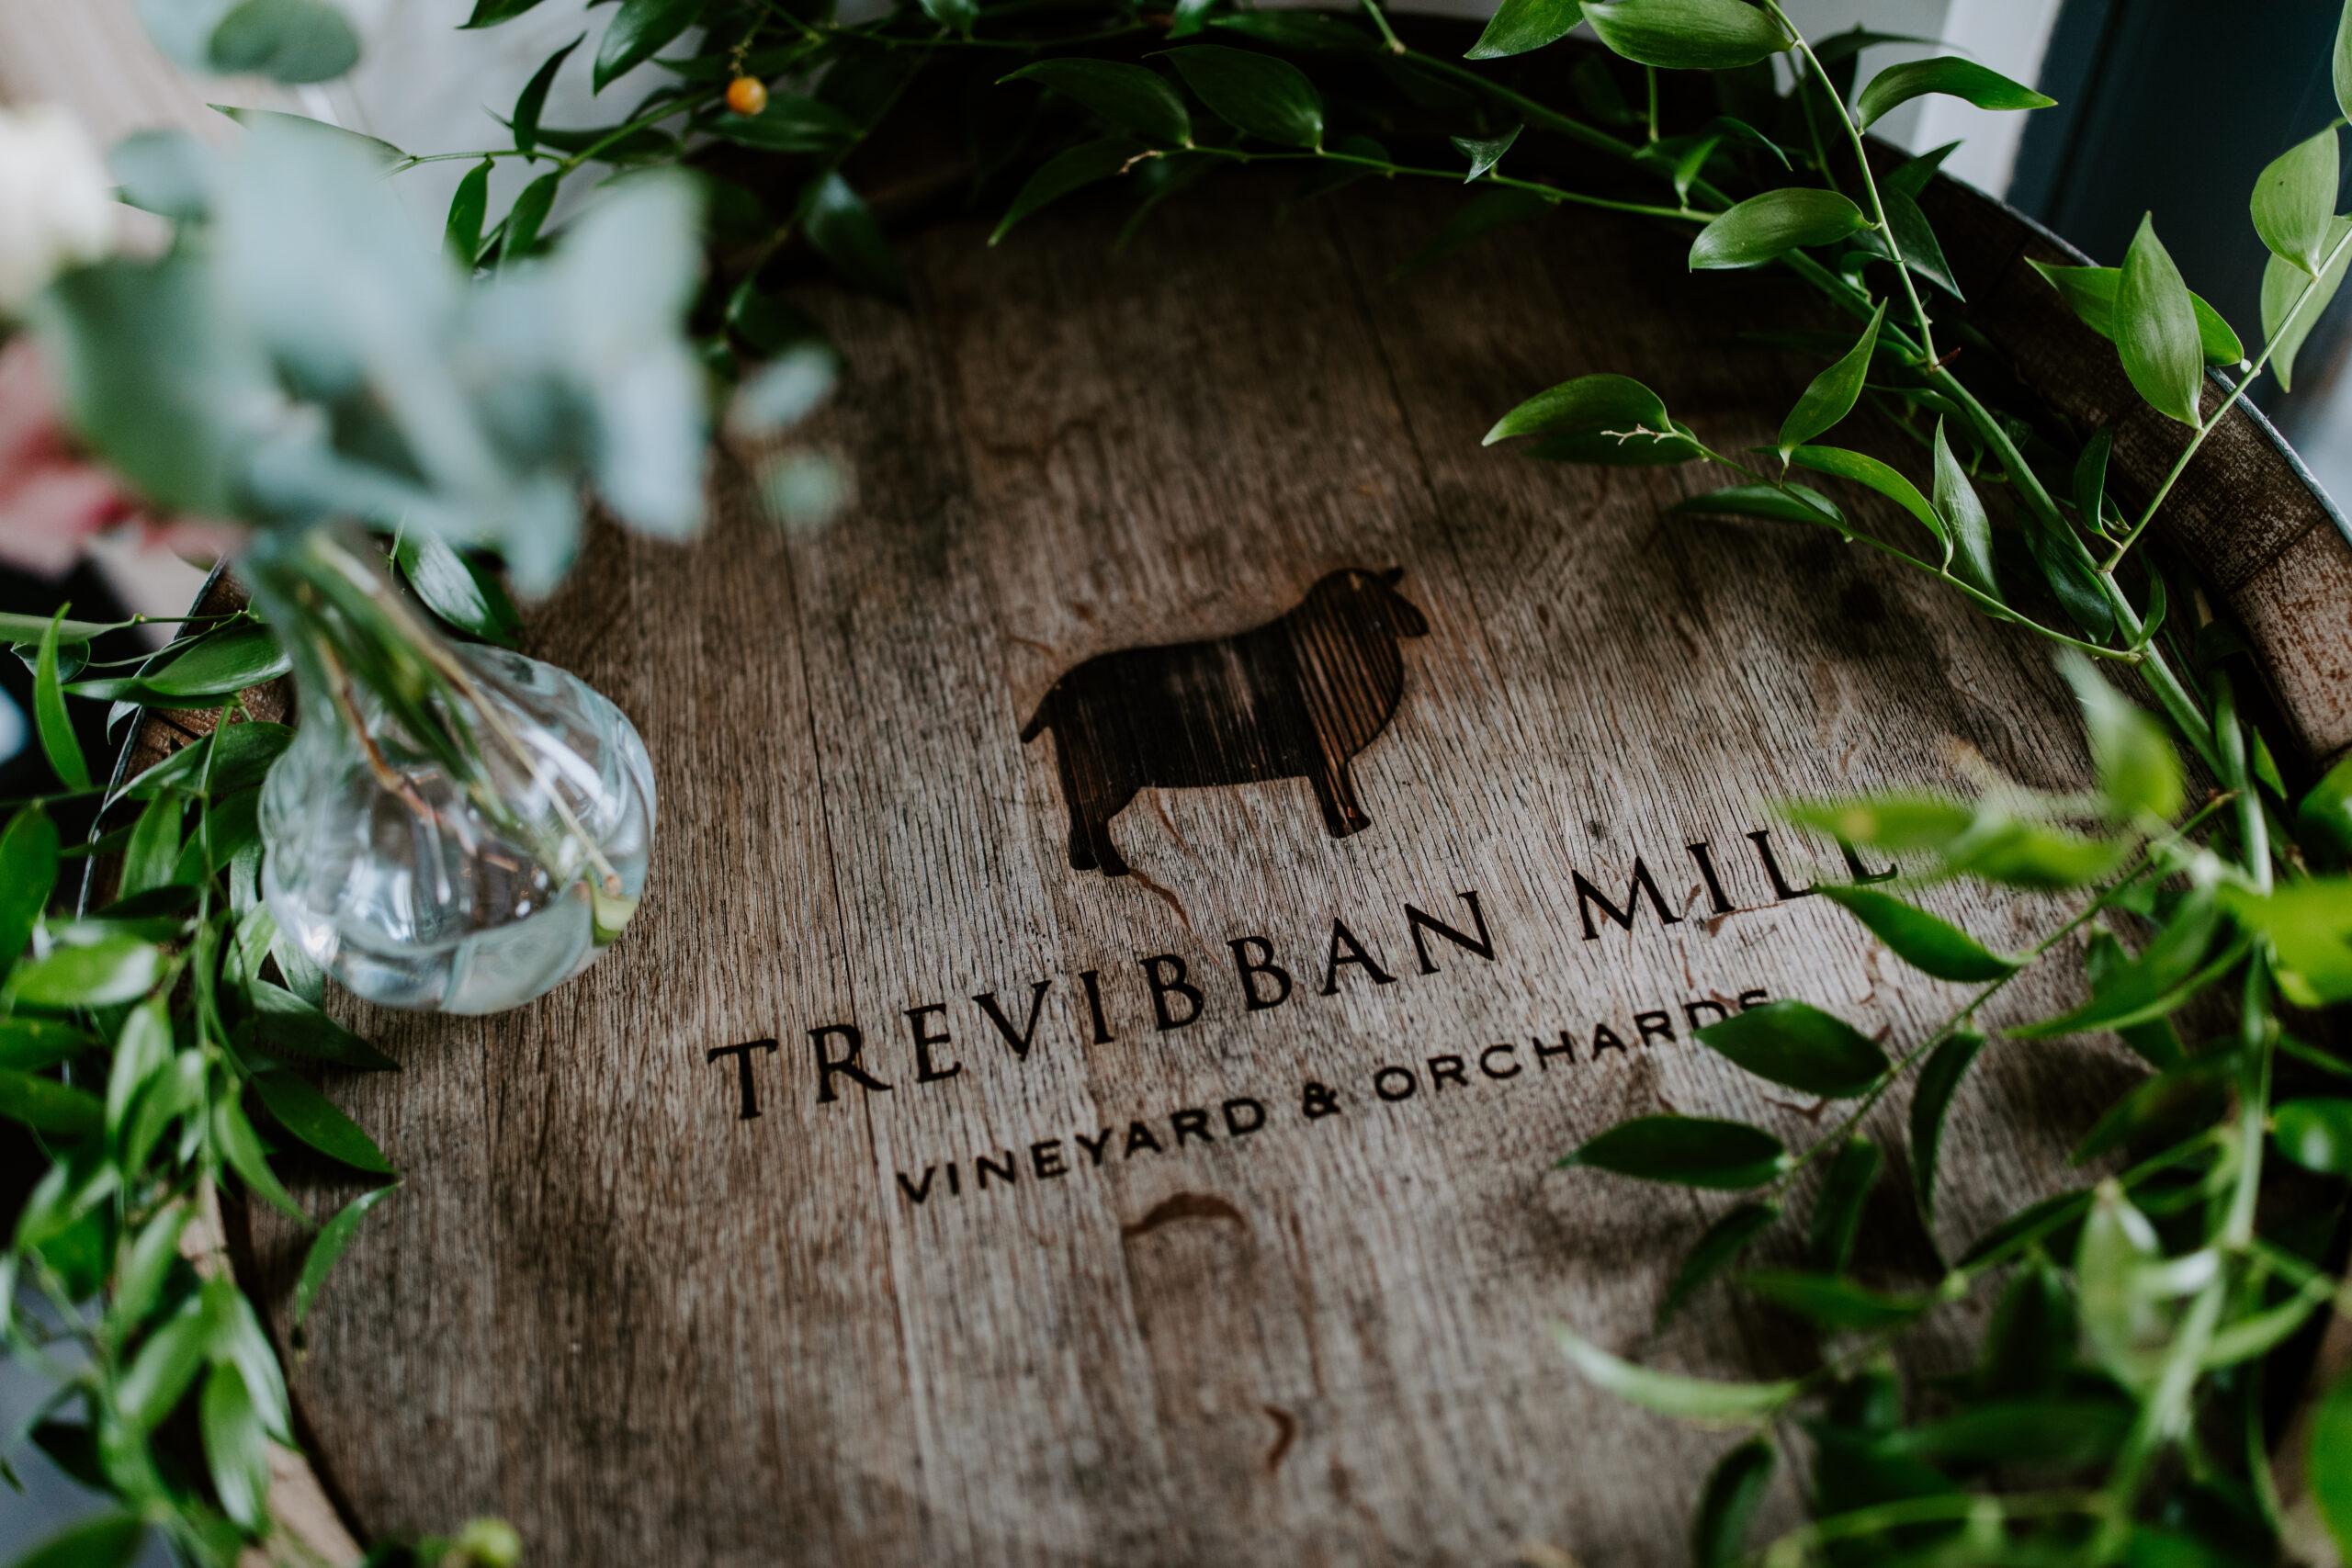 Trevibban Mill Wedding logo